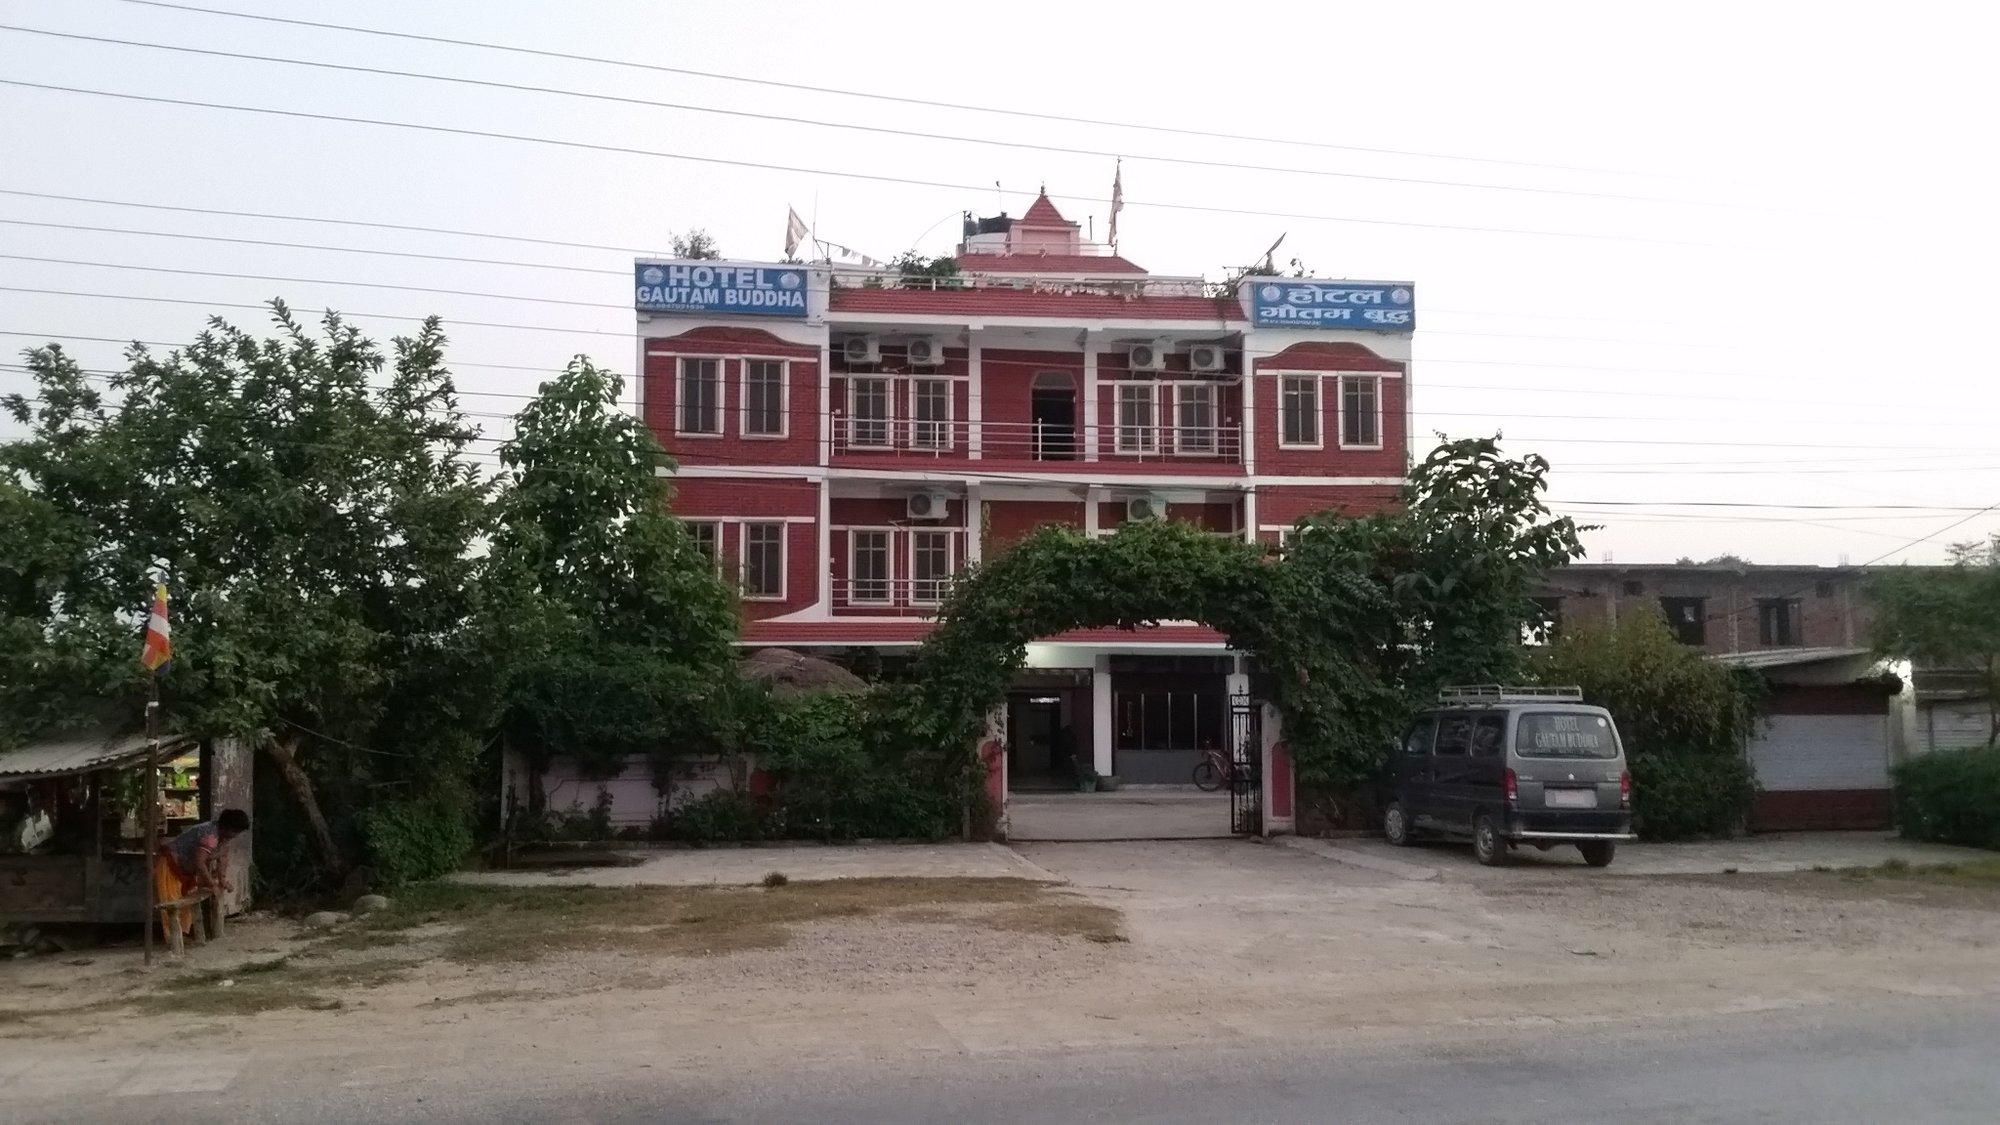 2018-10-03  Lumbini. Hotel Gautam Buddha01.jpg